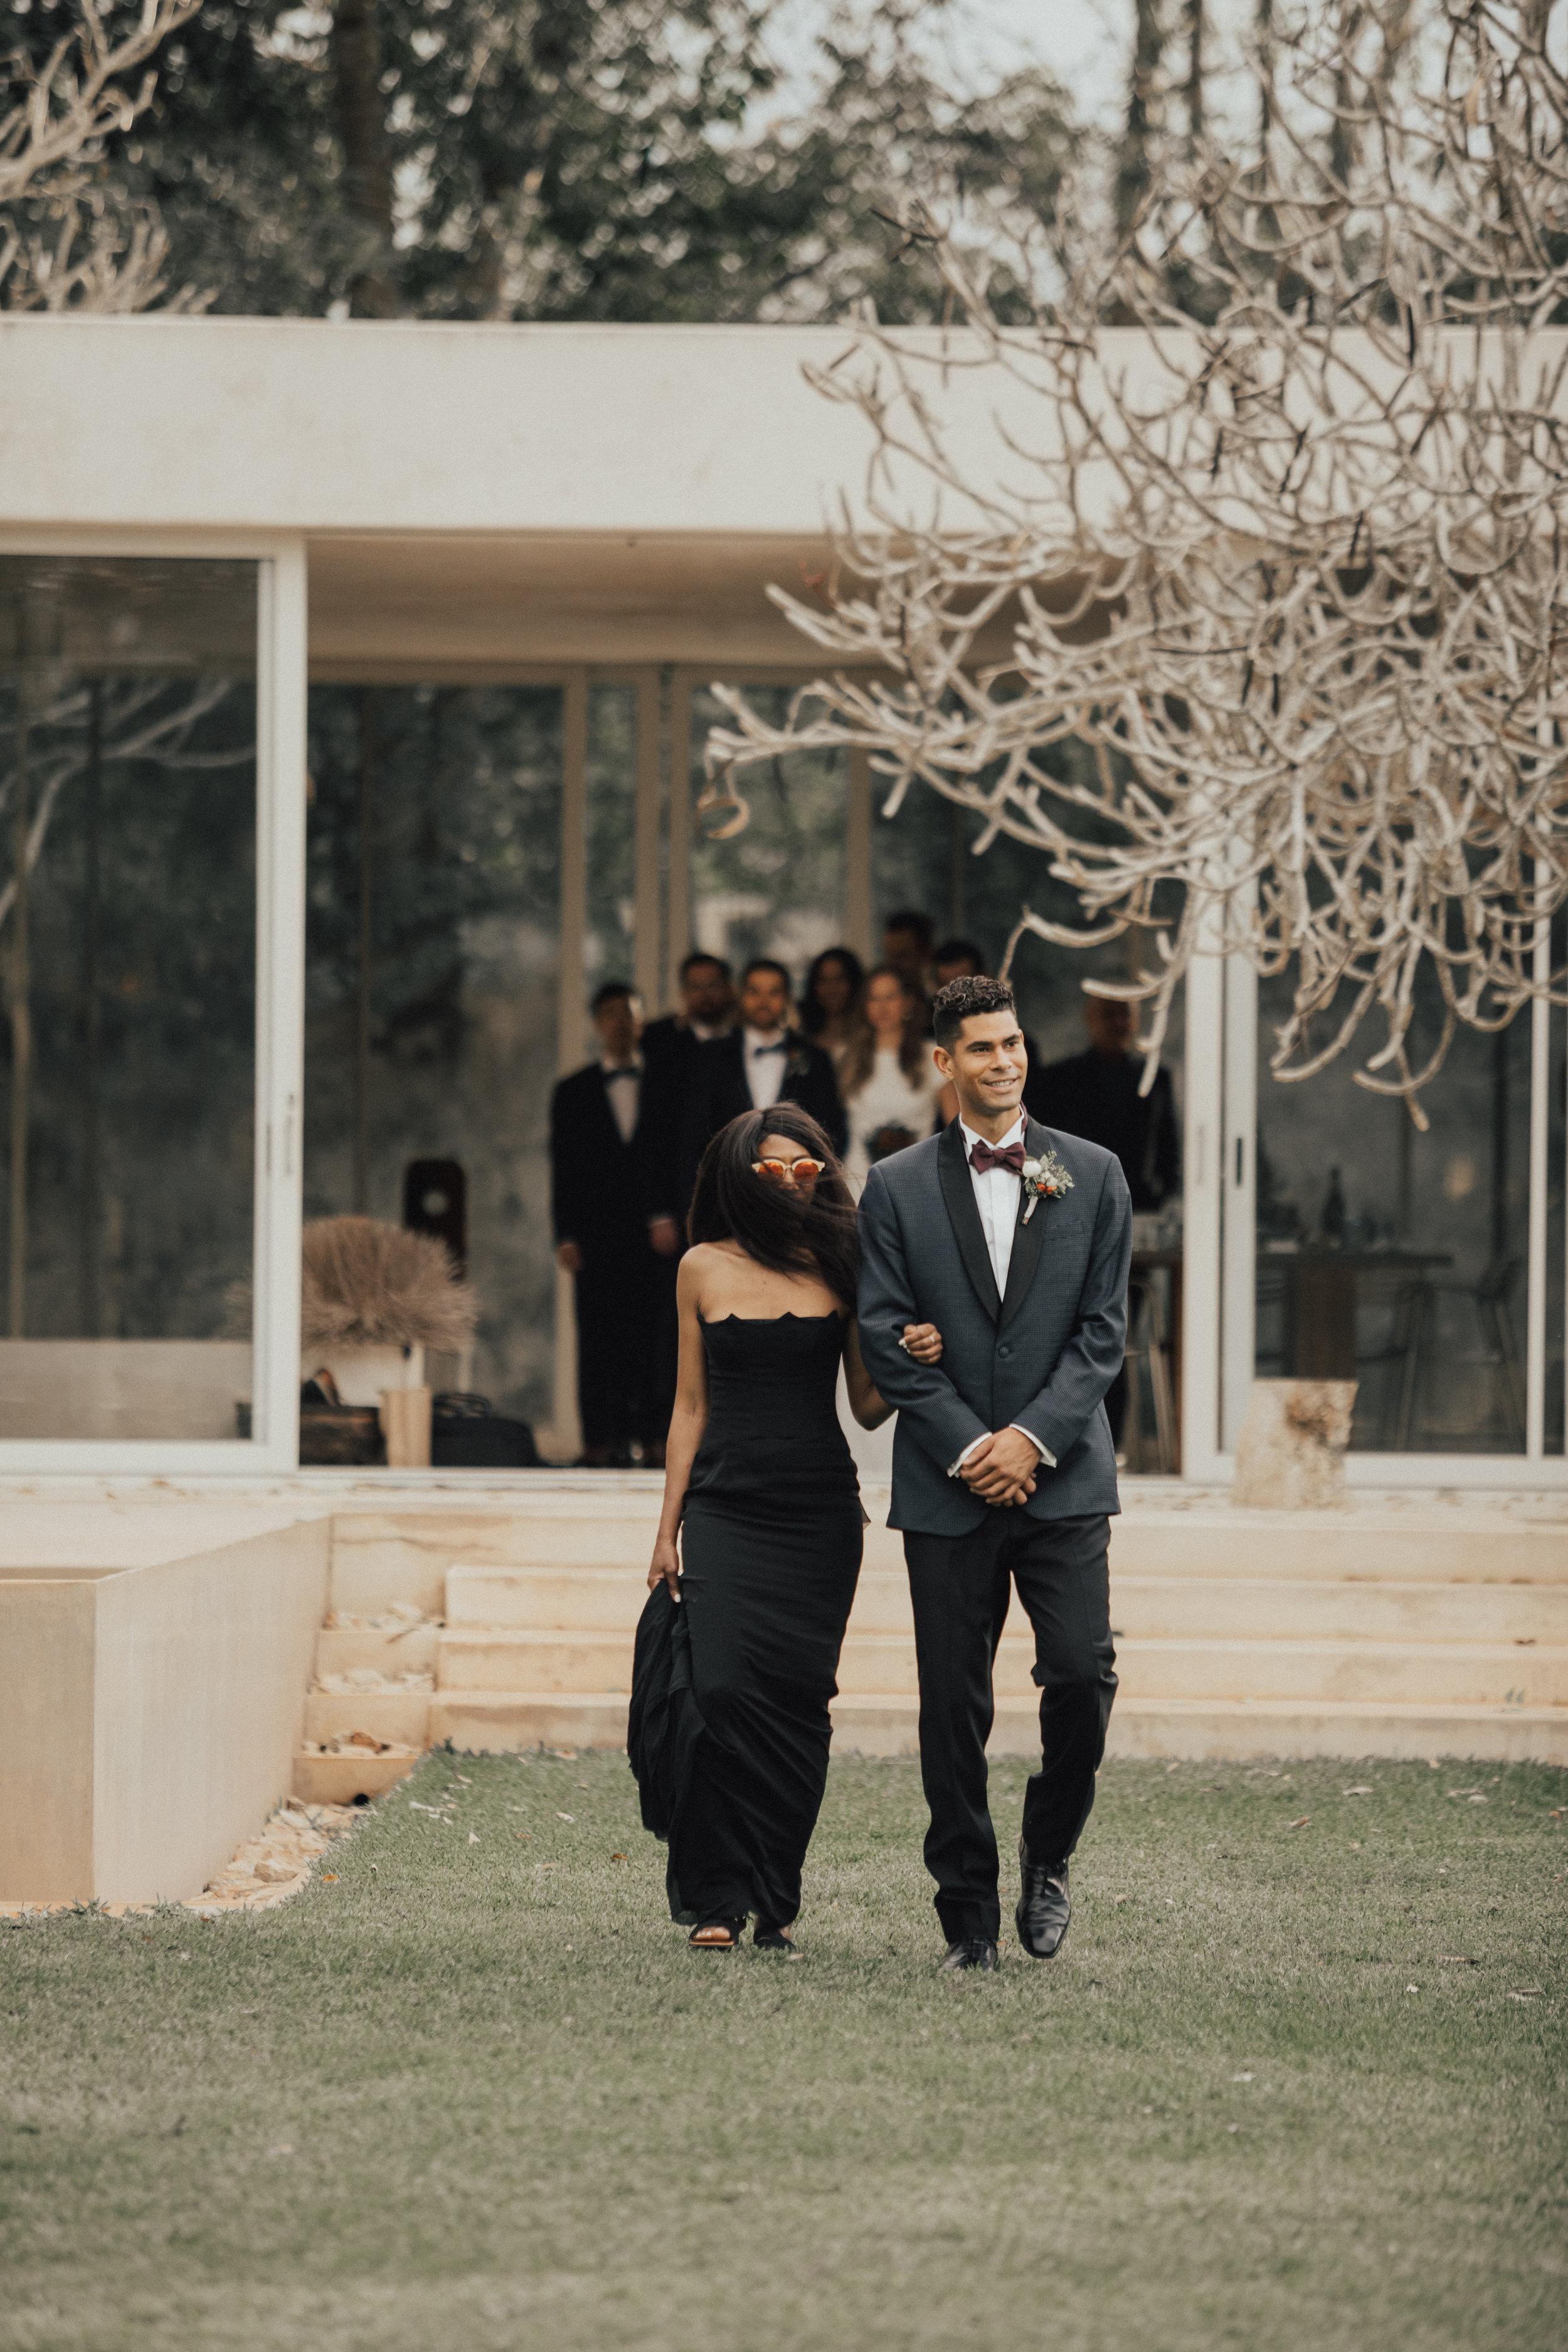 4 ceremony Tina Kai Merida Mexico Wedding  (67 of 134).jpg